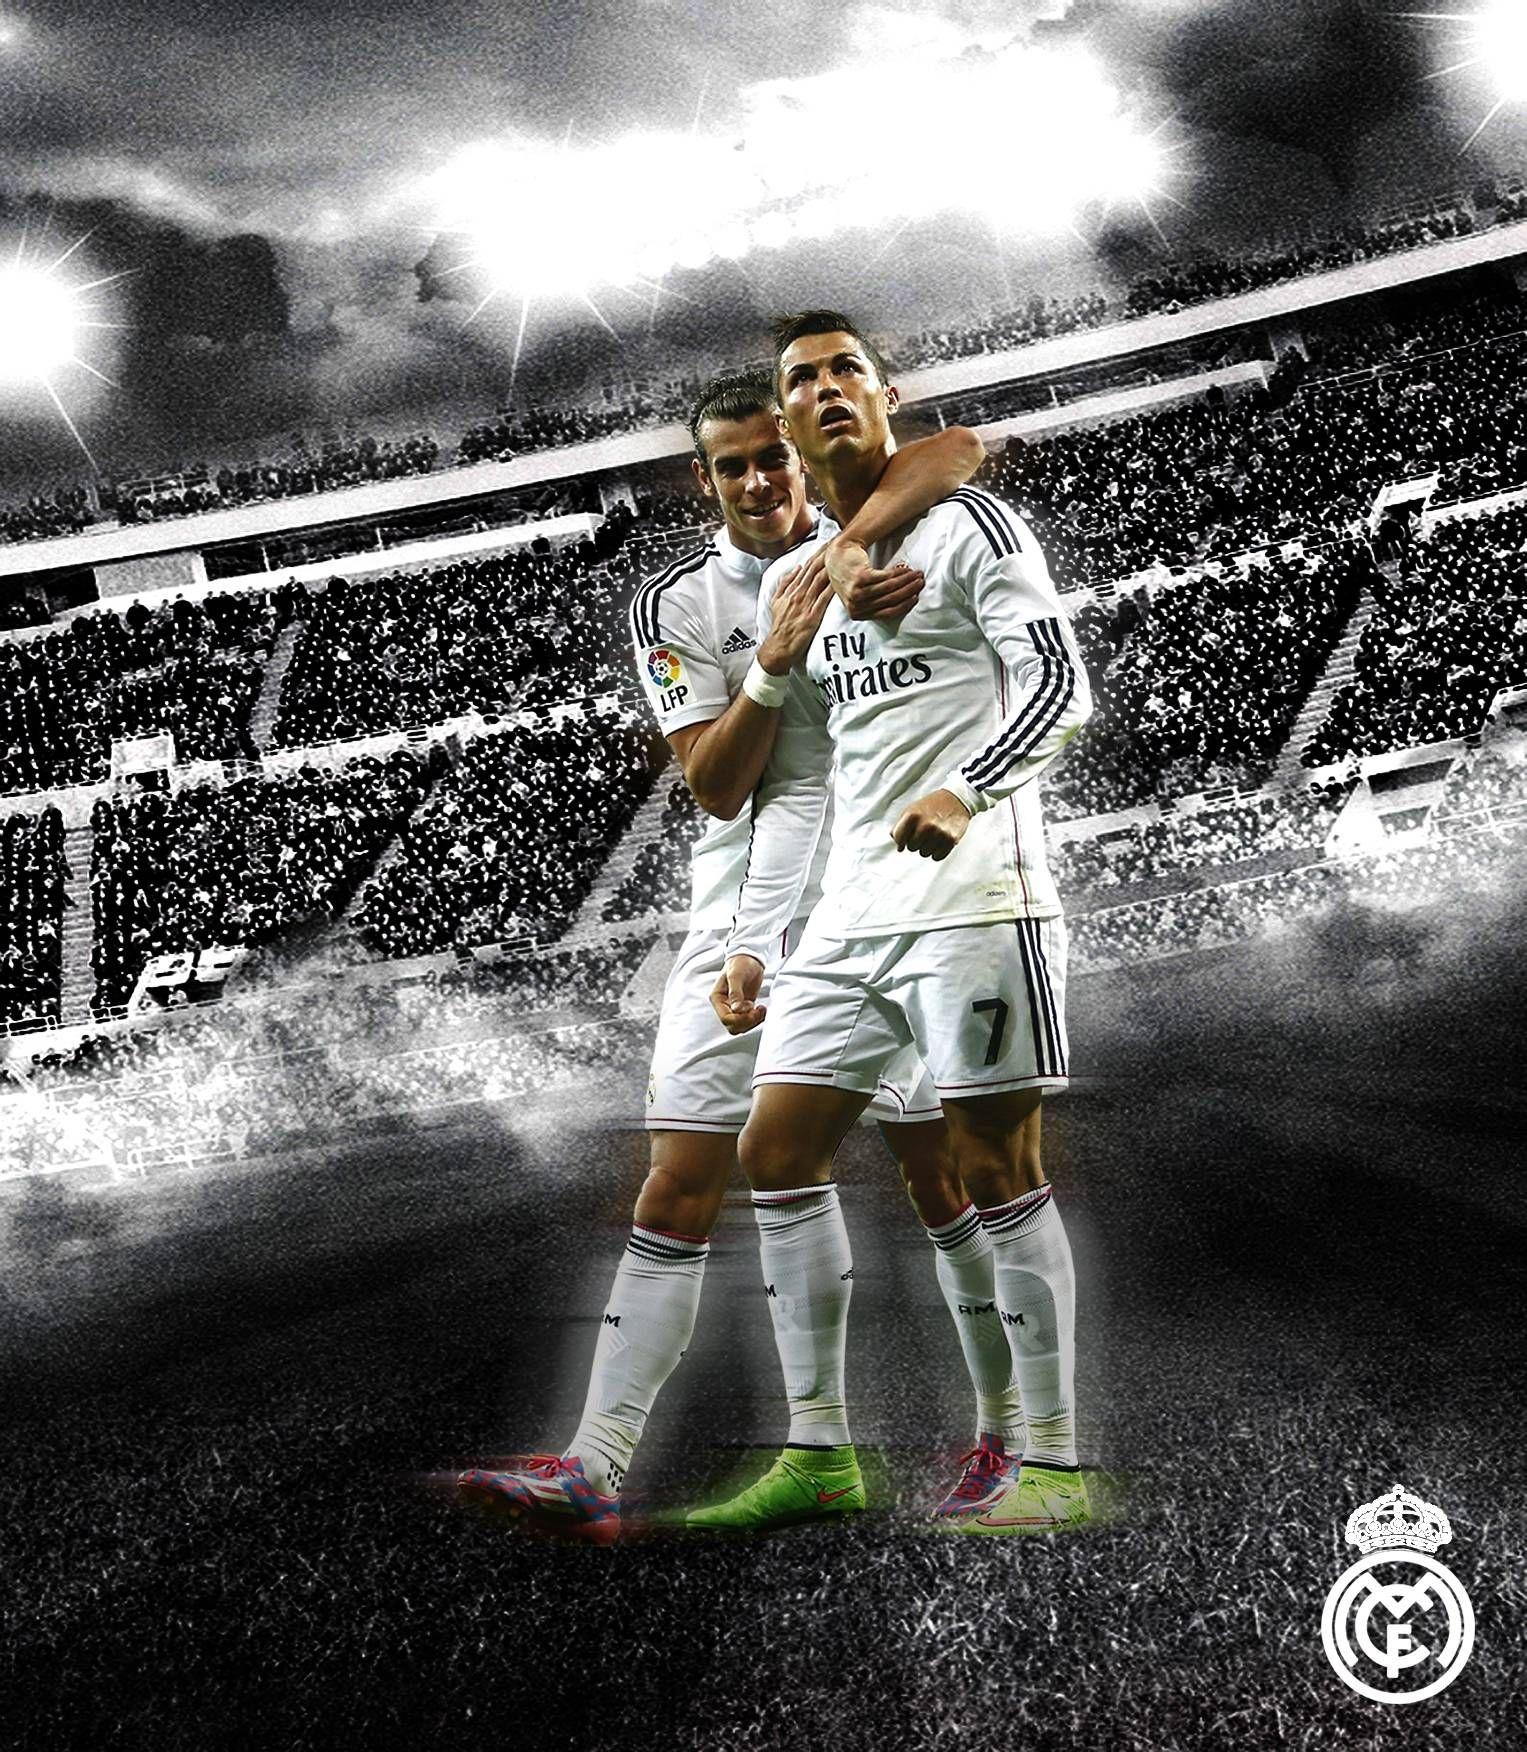 2016 Gareth Bale Wallpaper 14